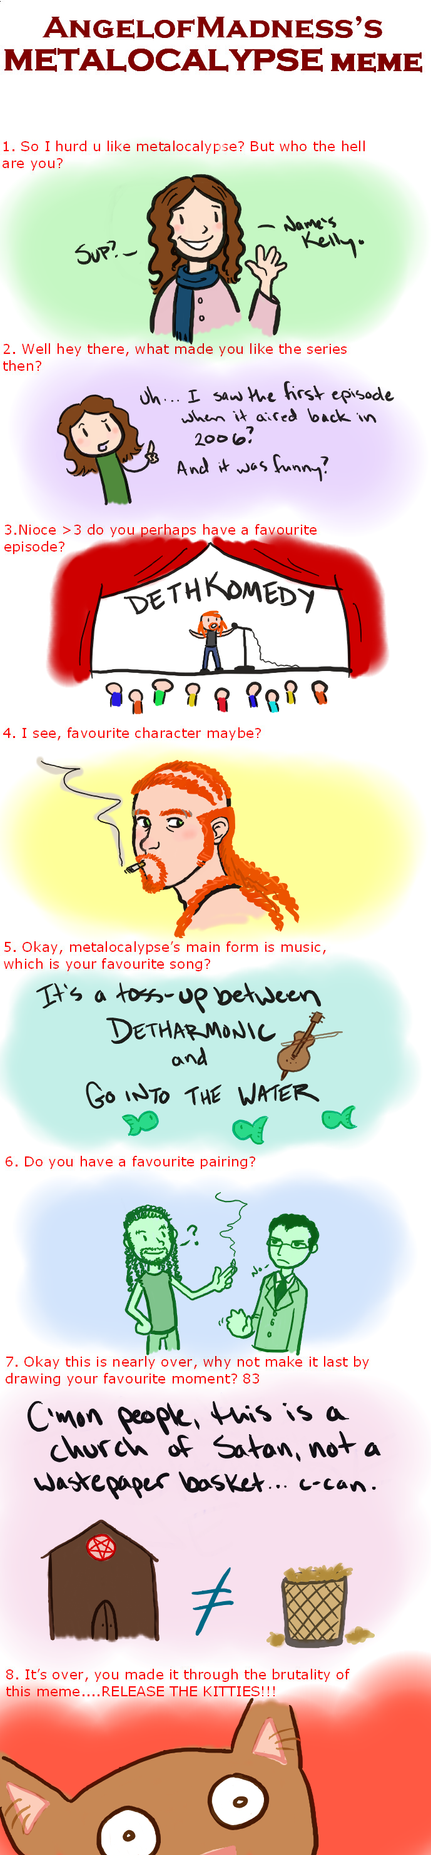 Metalocalypse Meme by KellyDawn